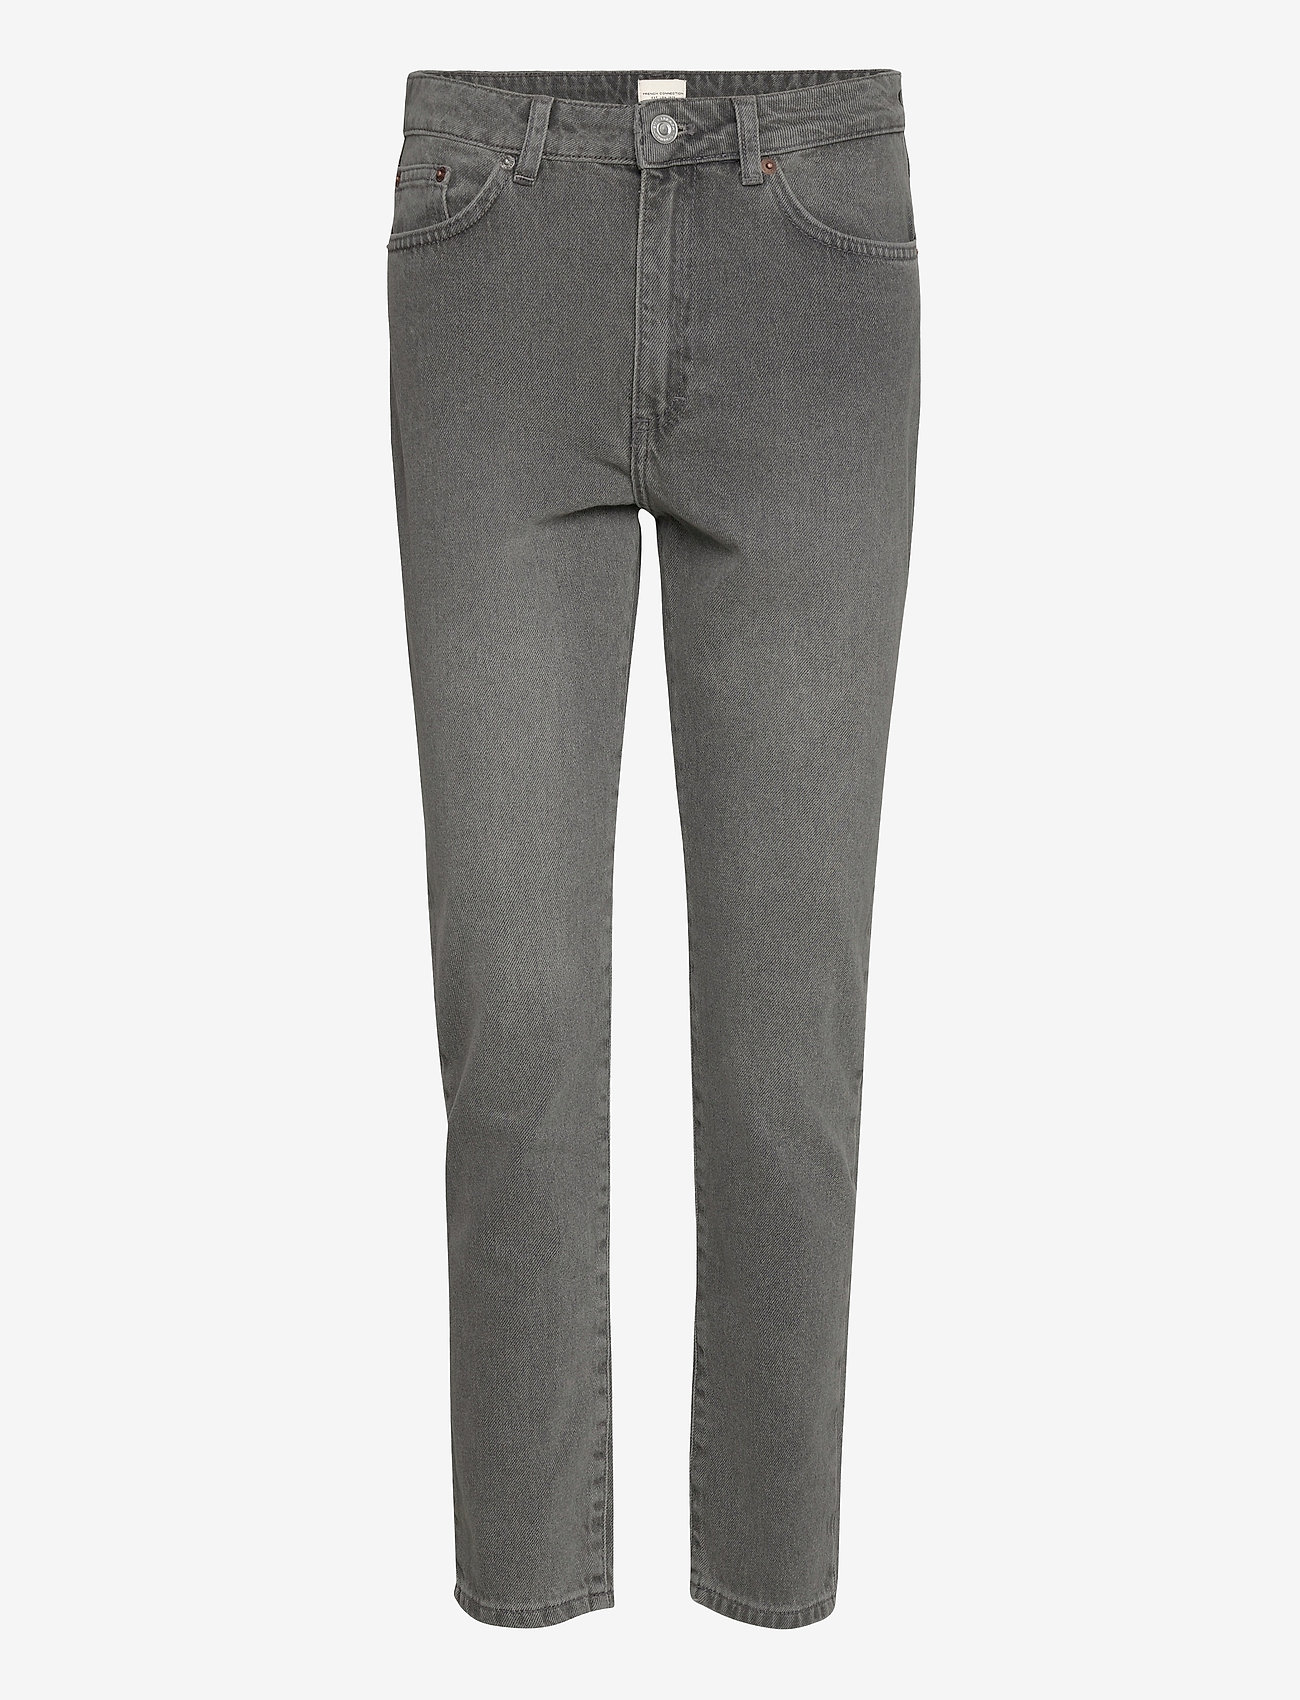 French Connection - PANDORAH ORD DEN CIGRETTE JEAN - slim jeans - washed grey - 1